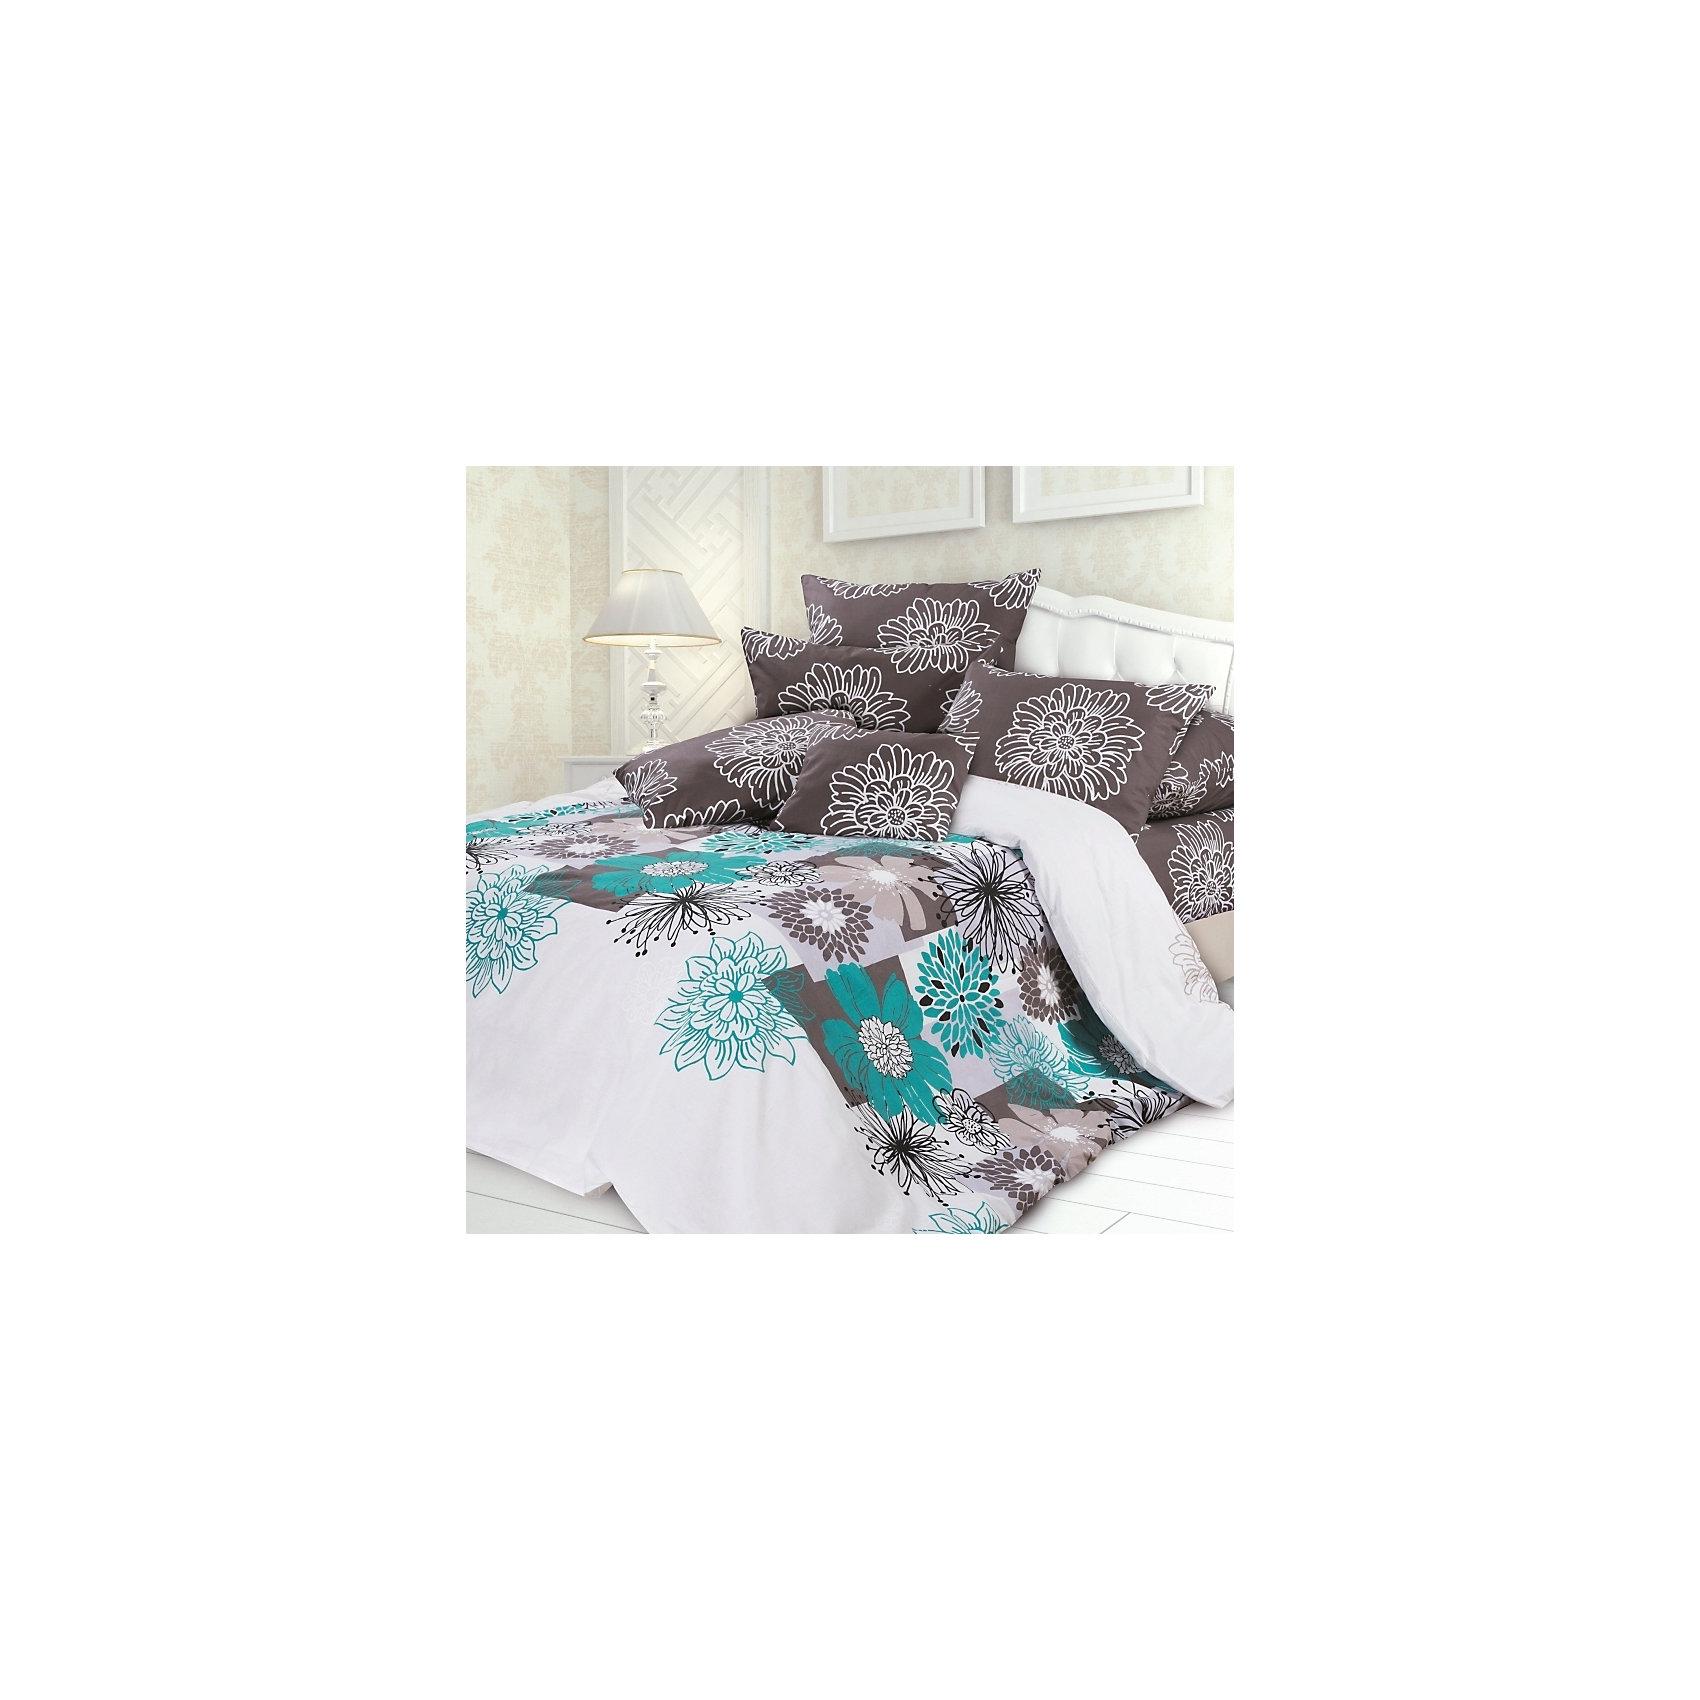 Унисон Постельное белье 1,5 Беатрисс, Унисон биоматин unison 5 спальное биоматин new тиффани